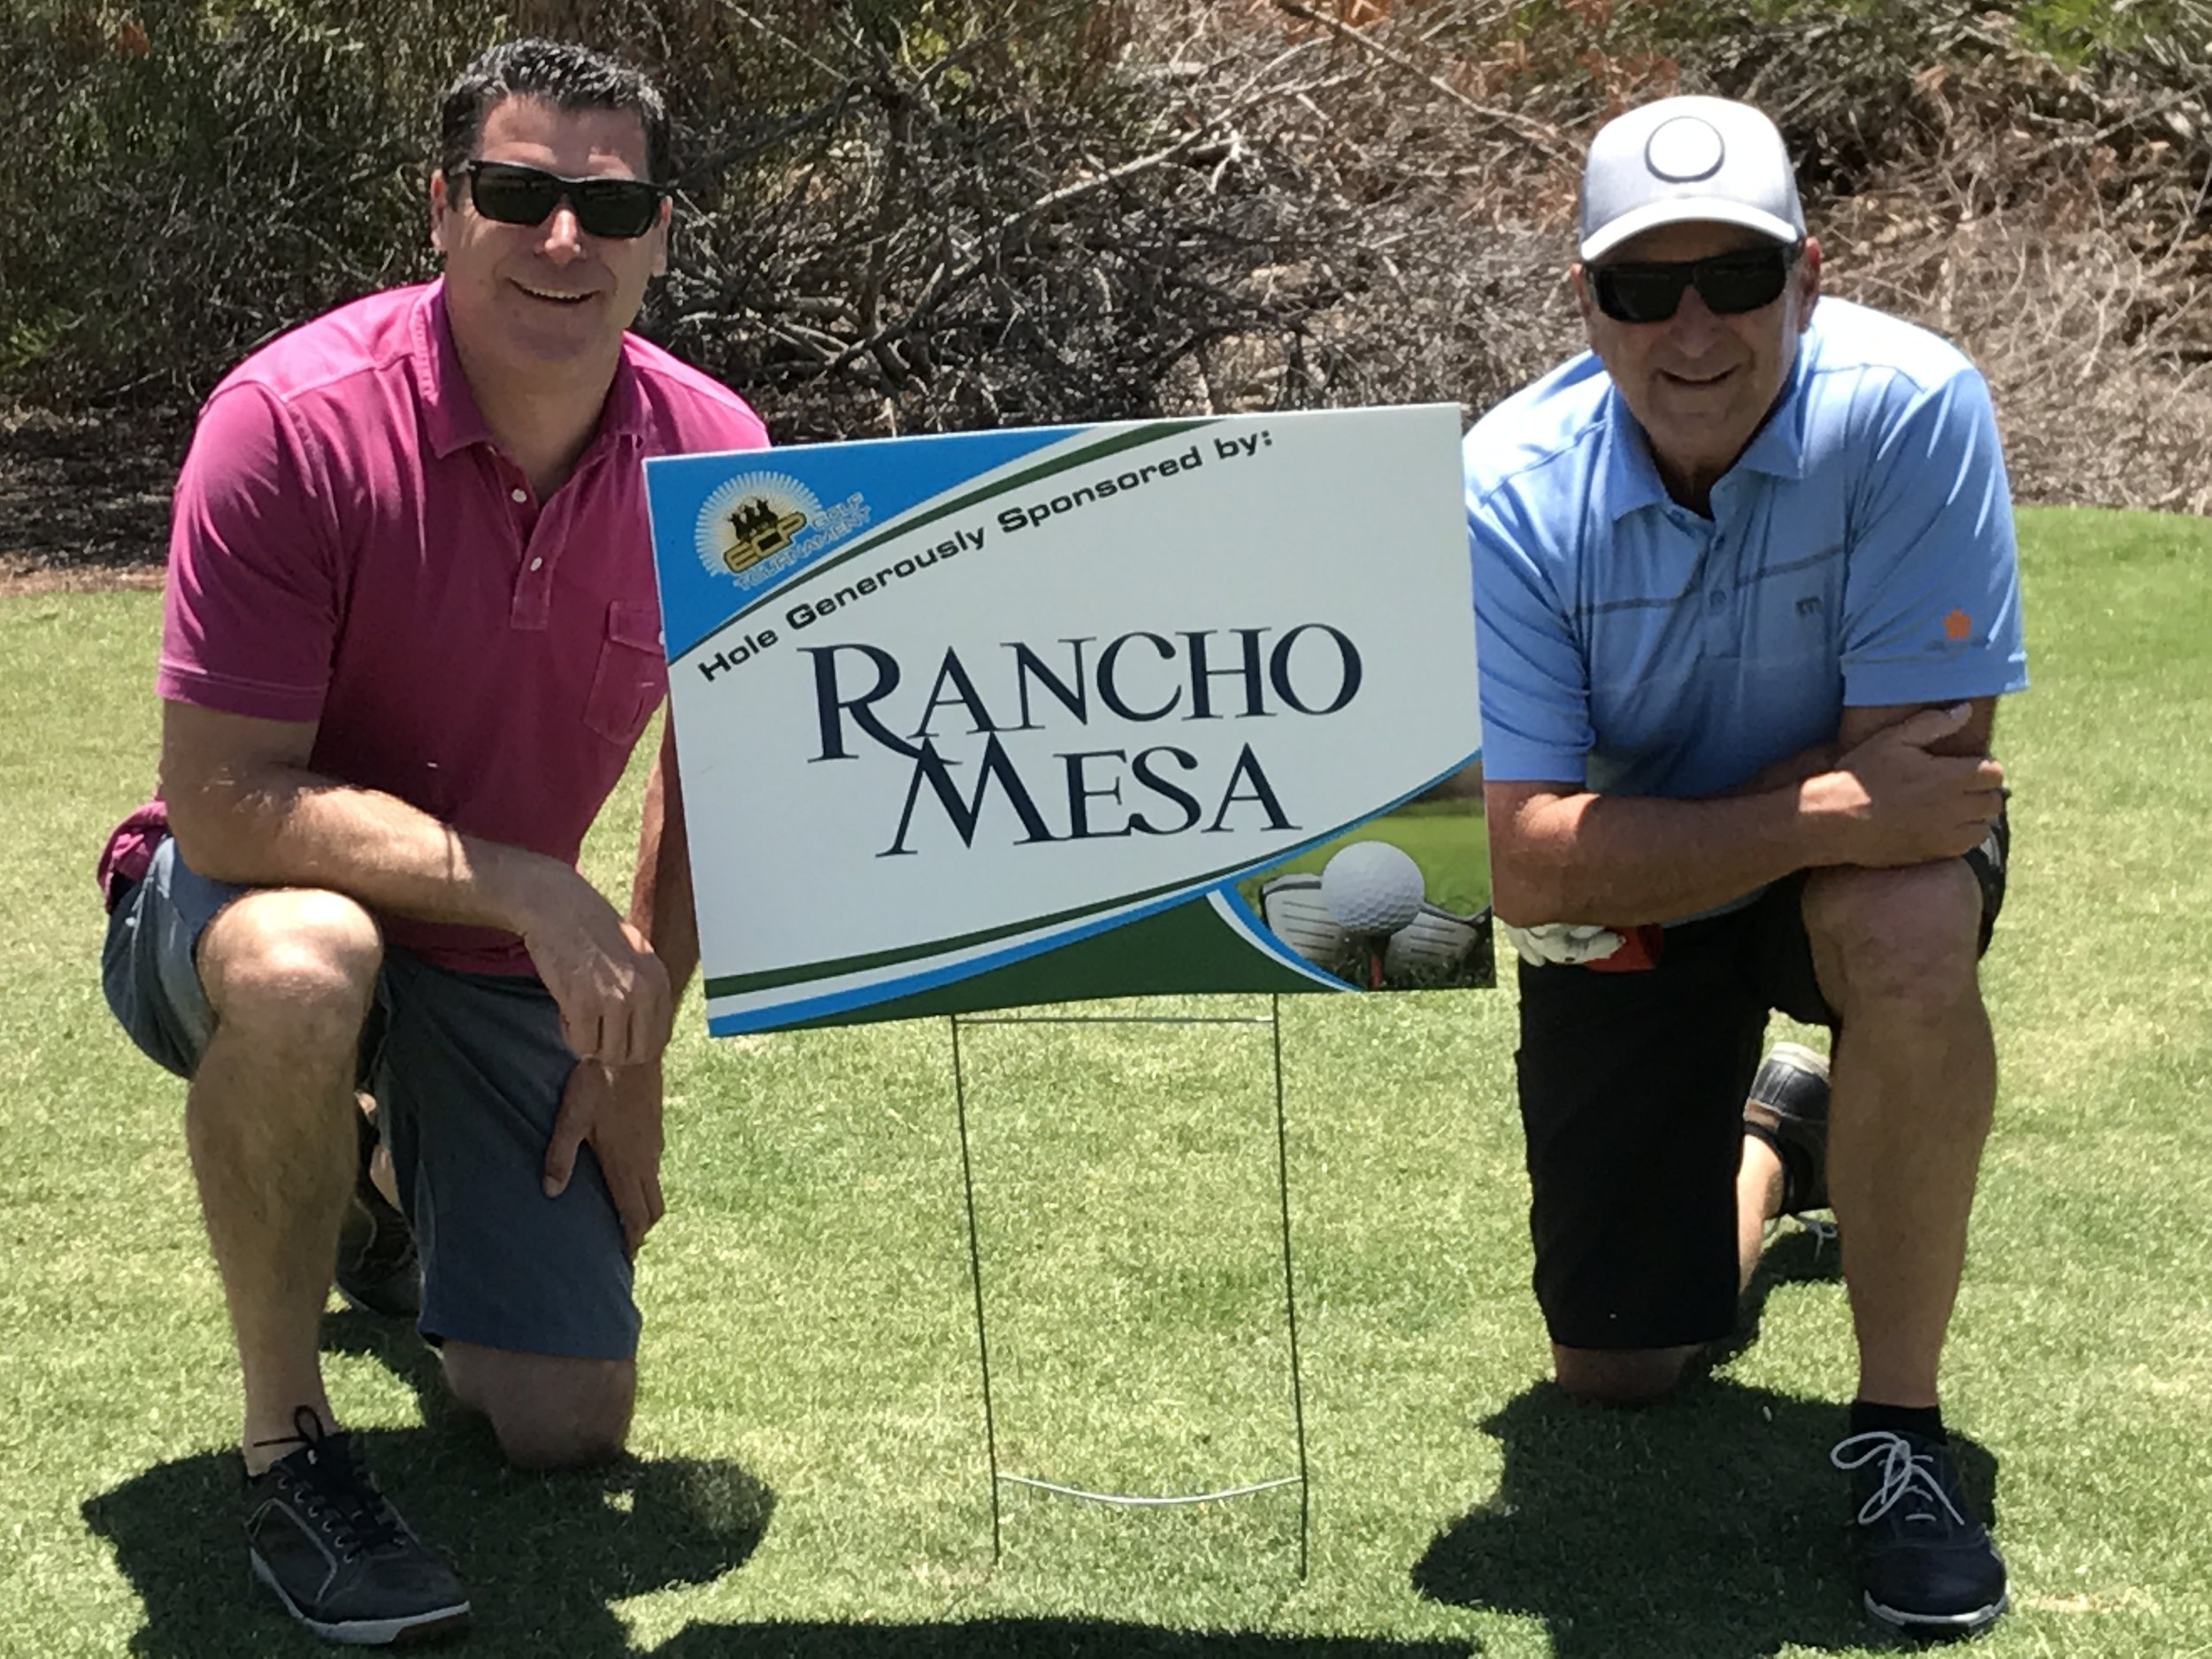 Sam Clayton and Dave Garcia kneel next to the Rancho Mesa Hole Sponsorship sign.